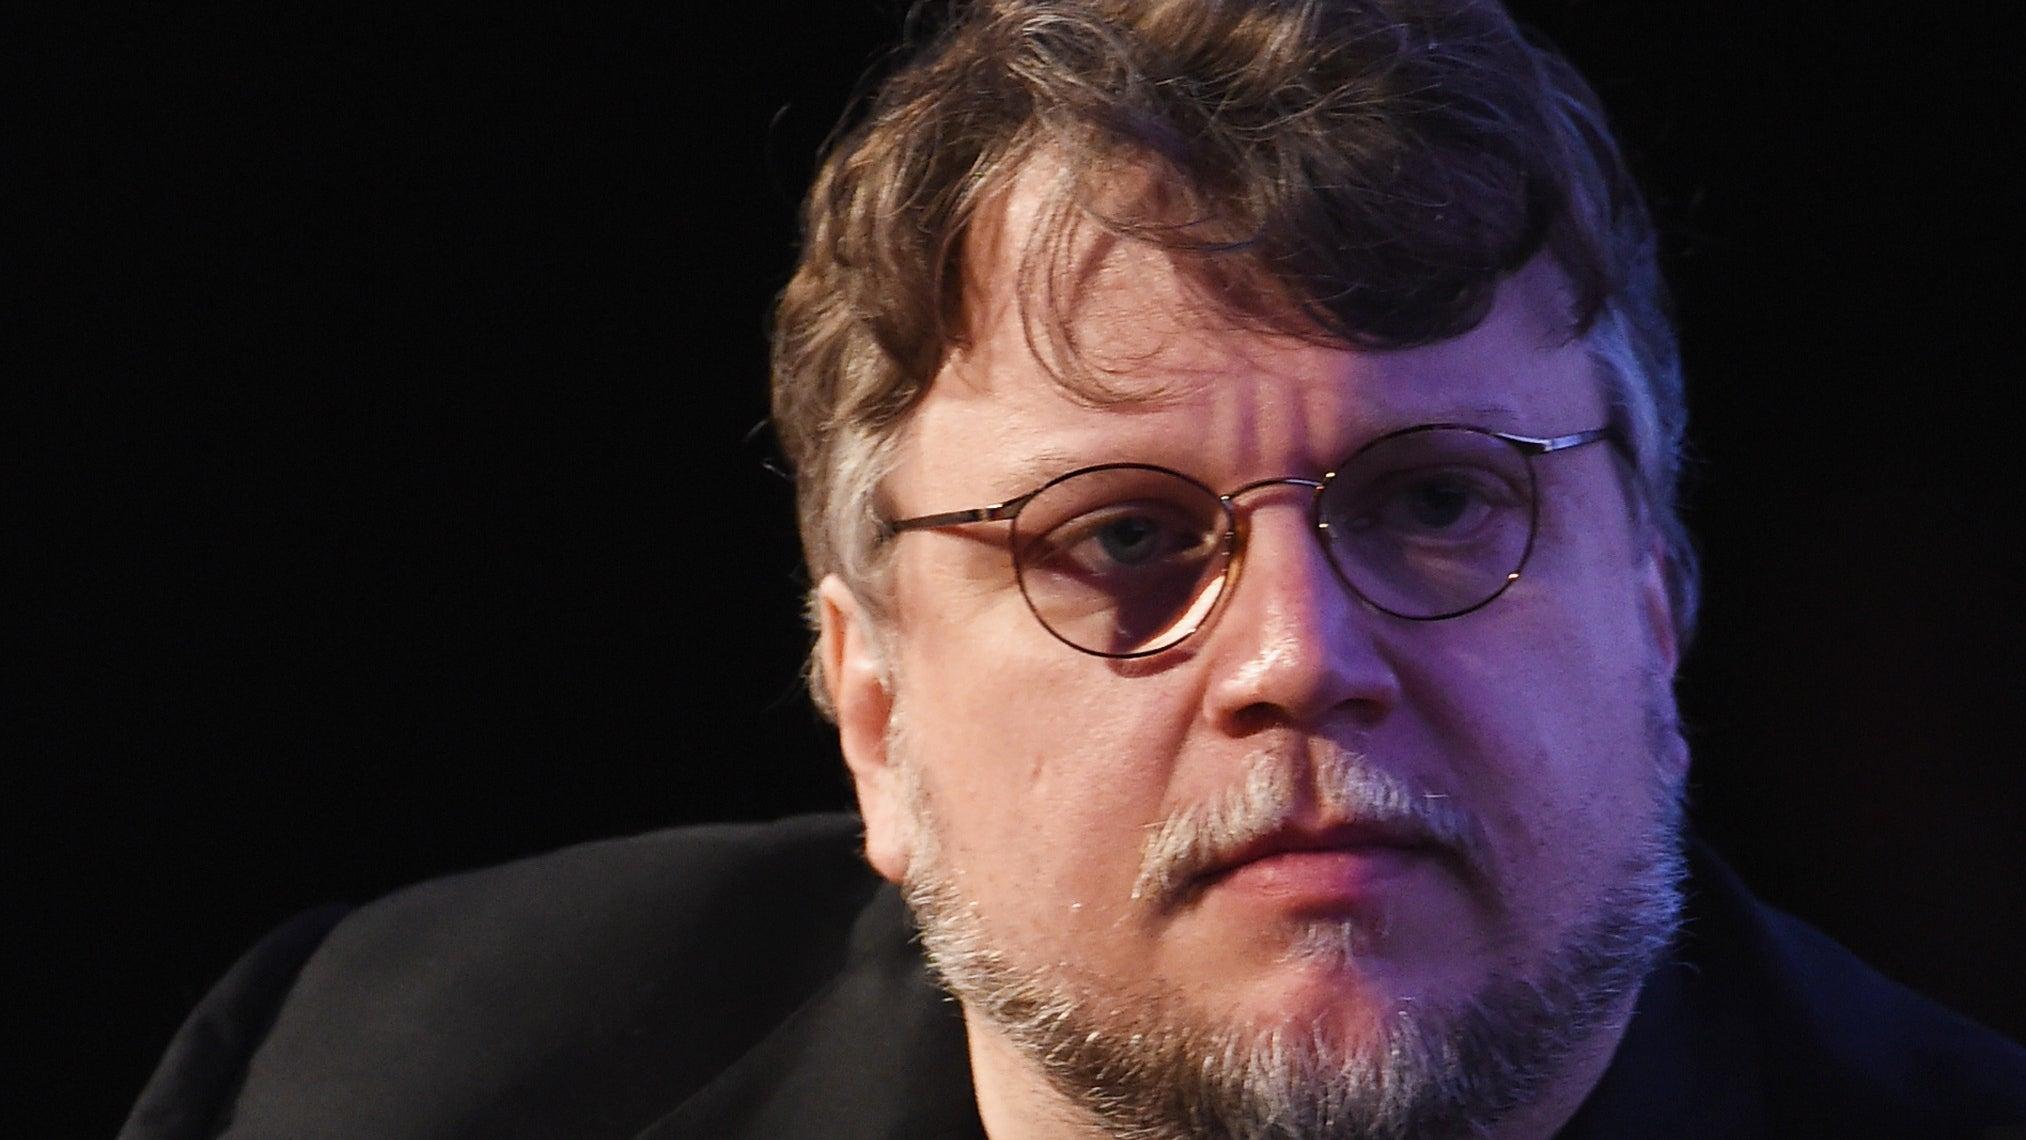 Guillermo Del Toro Says Dead Video Games Have Left Him 'Reeling'